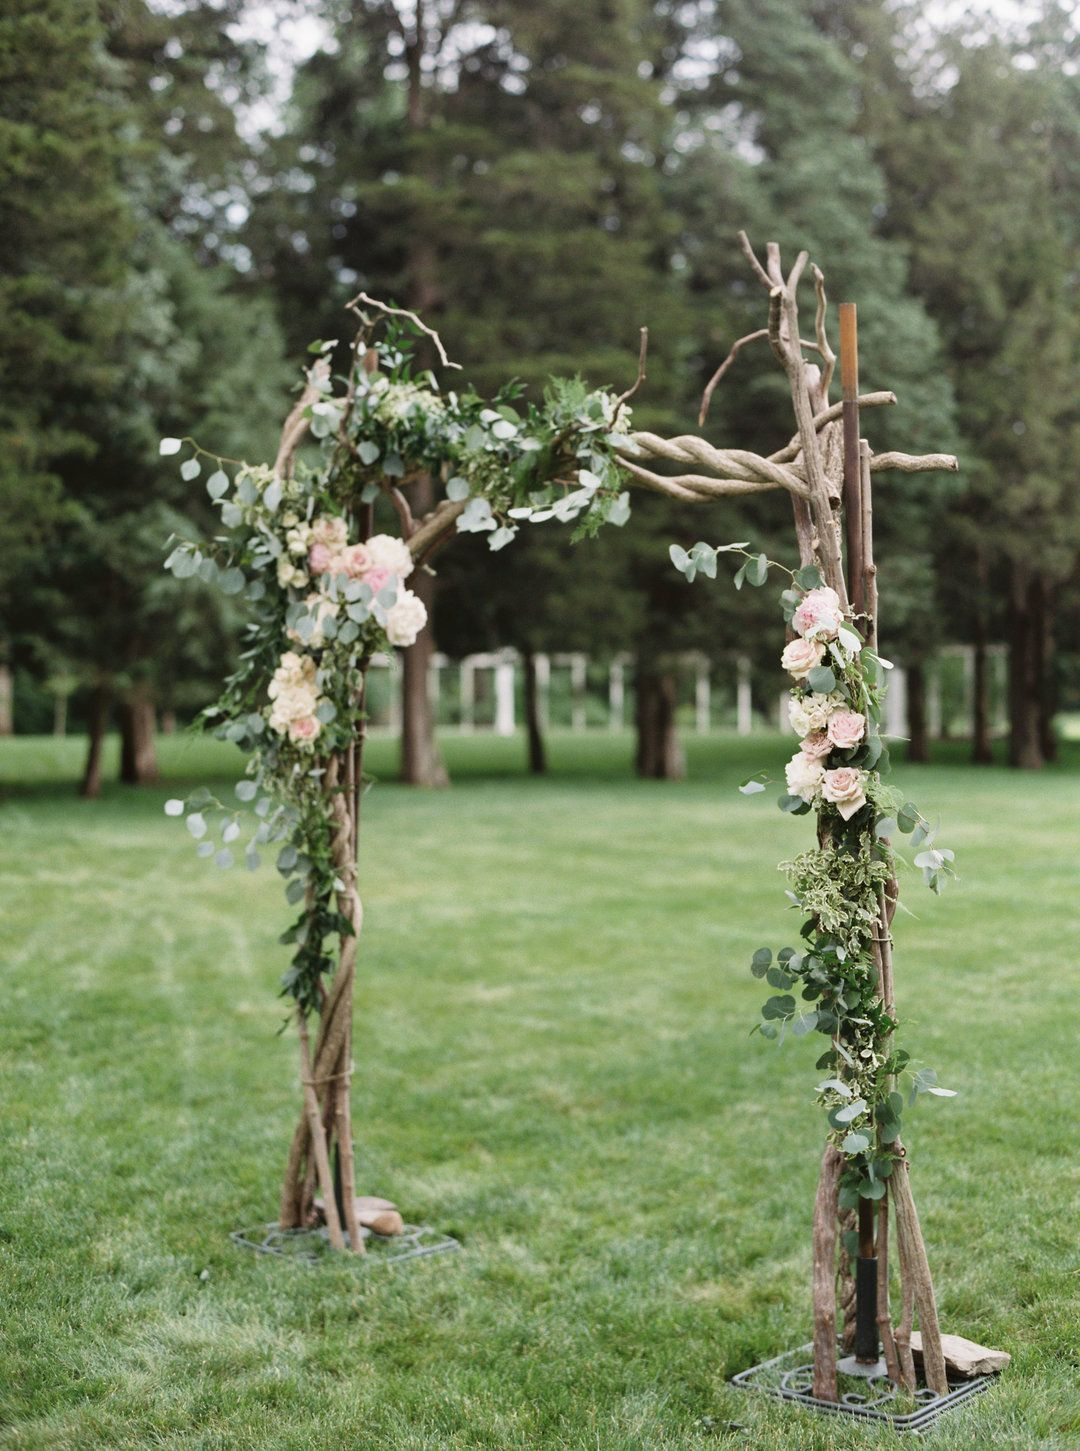 Romantic Wedding Arbor Outdoor Wedding Ceremony Rustic Romance White And Pink Flowers Wooden Branch Wedding Arbors Outdoor Wedding Ceremony Outdoor Wedding